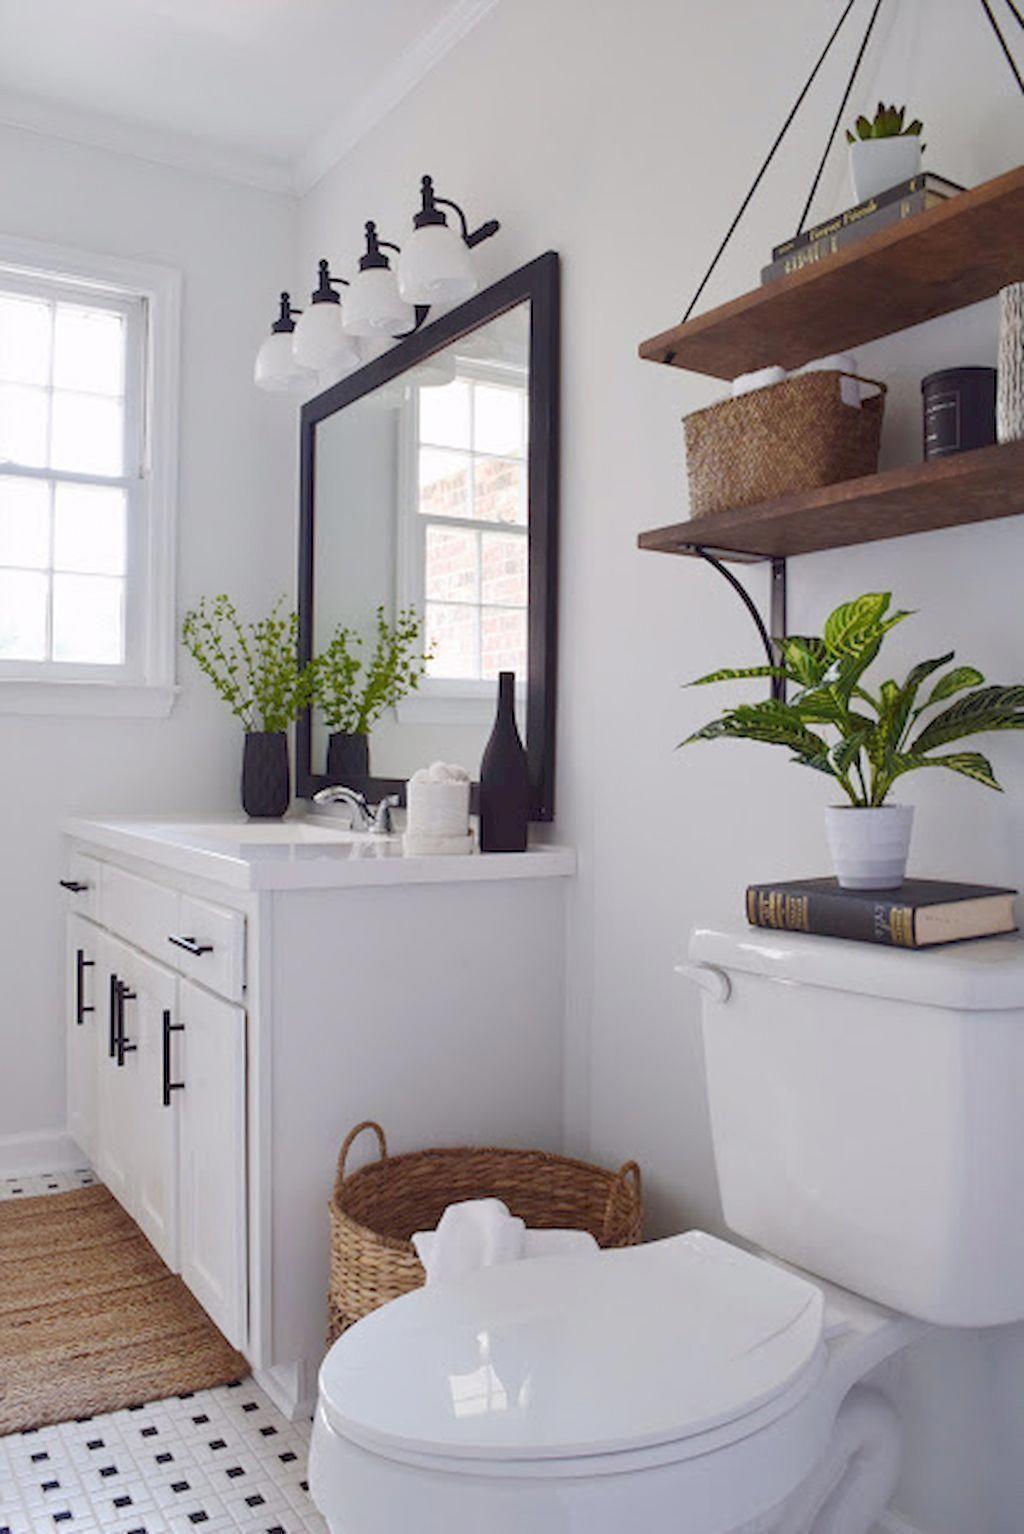 average cost of bathroom remodel per square foot #bathroomdeco